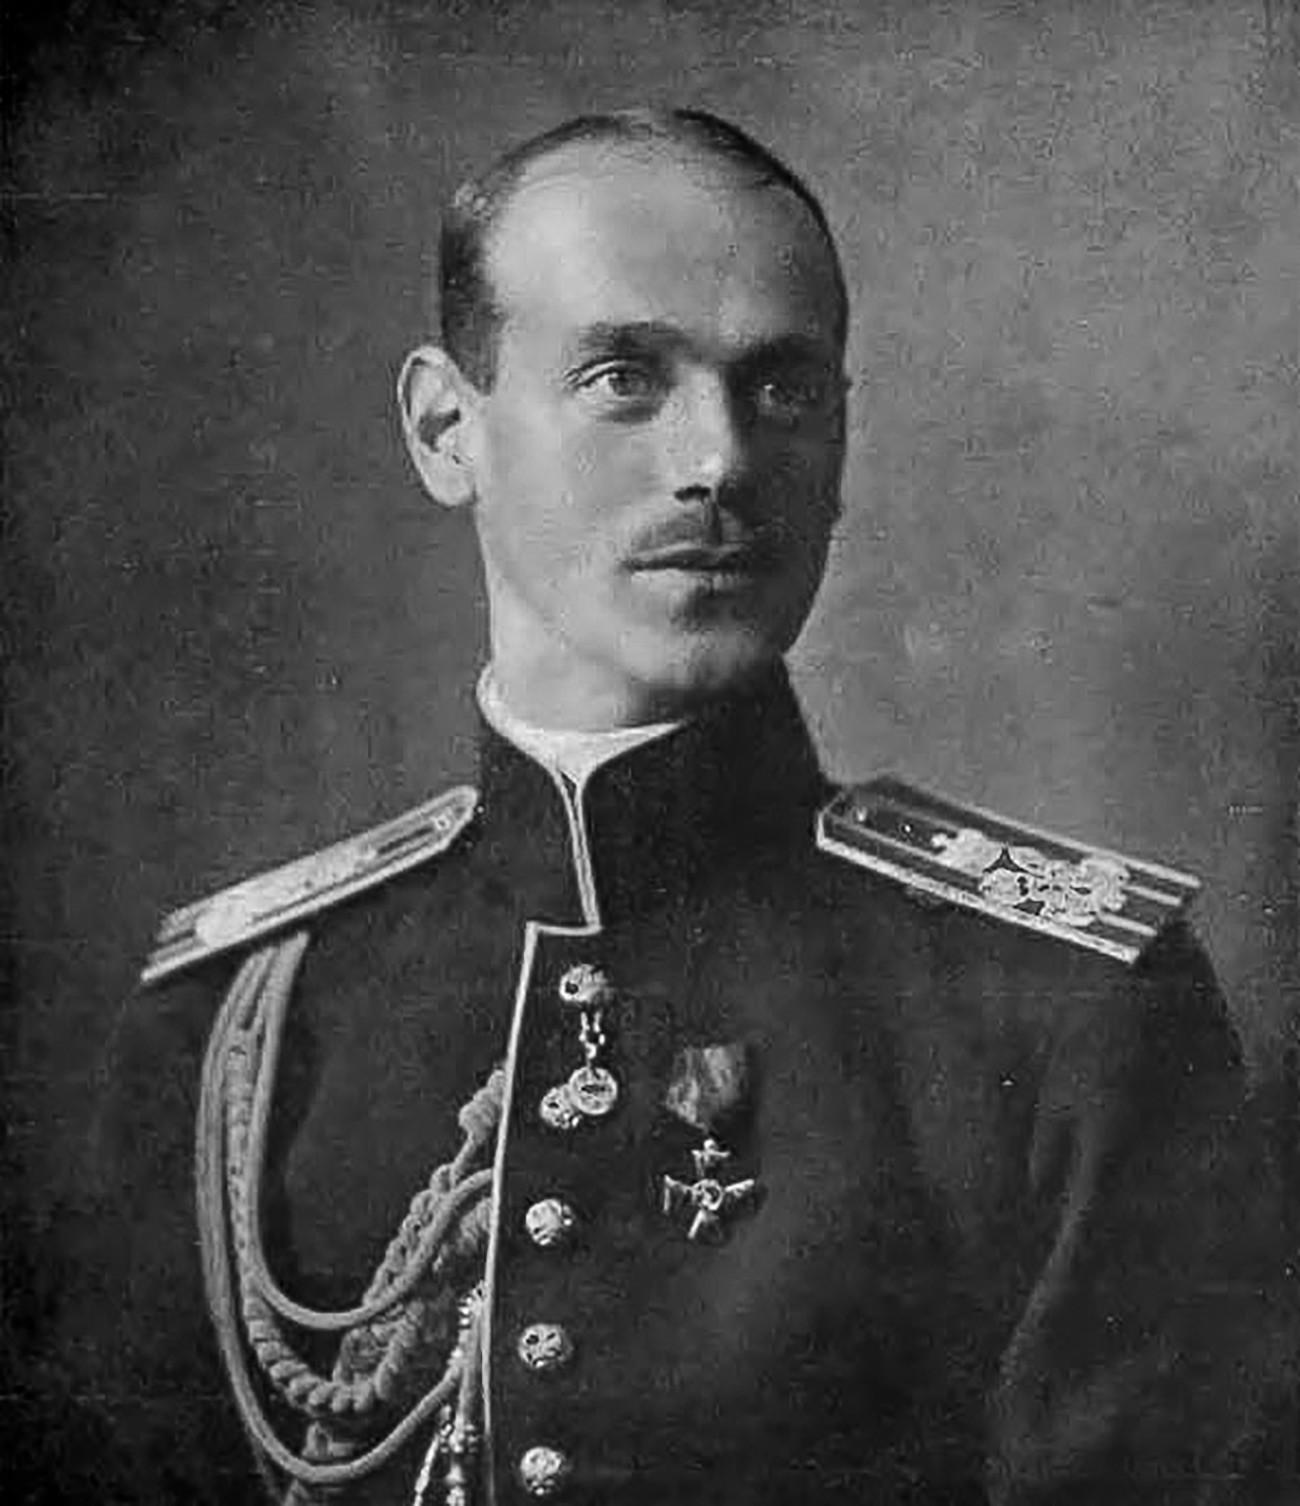 Ruski veliki knez Mihail Aleksandrovič, mlađi brat posljednjeg ruskog cara Nikolaja II.